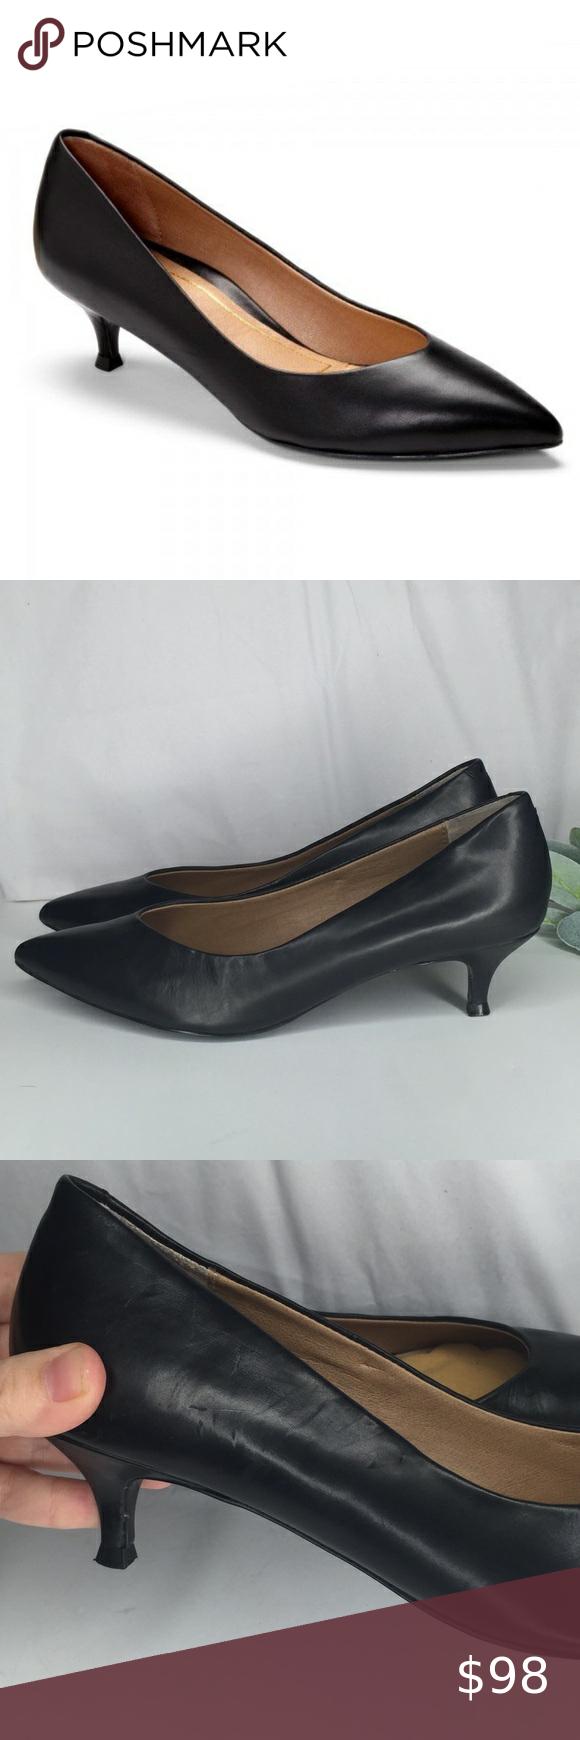 Vionic Josie Kitten Heels Black Leather Pumps 8 In 2020 Black Leather Pumps Trending Shoes Black Heels